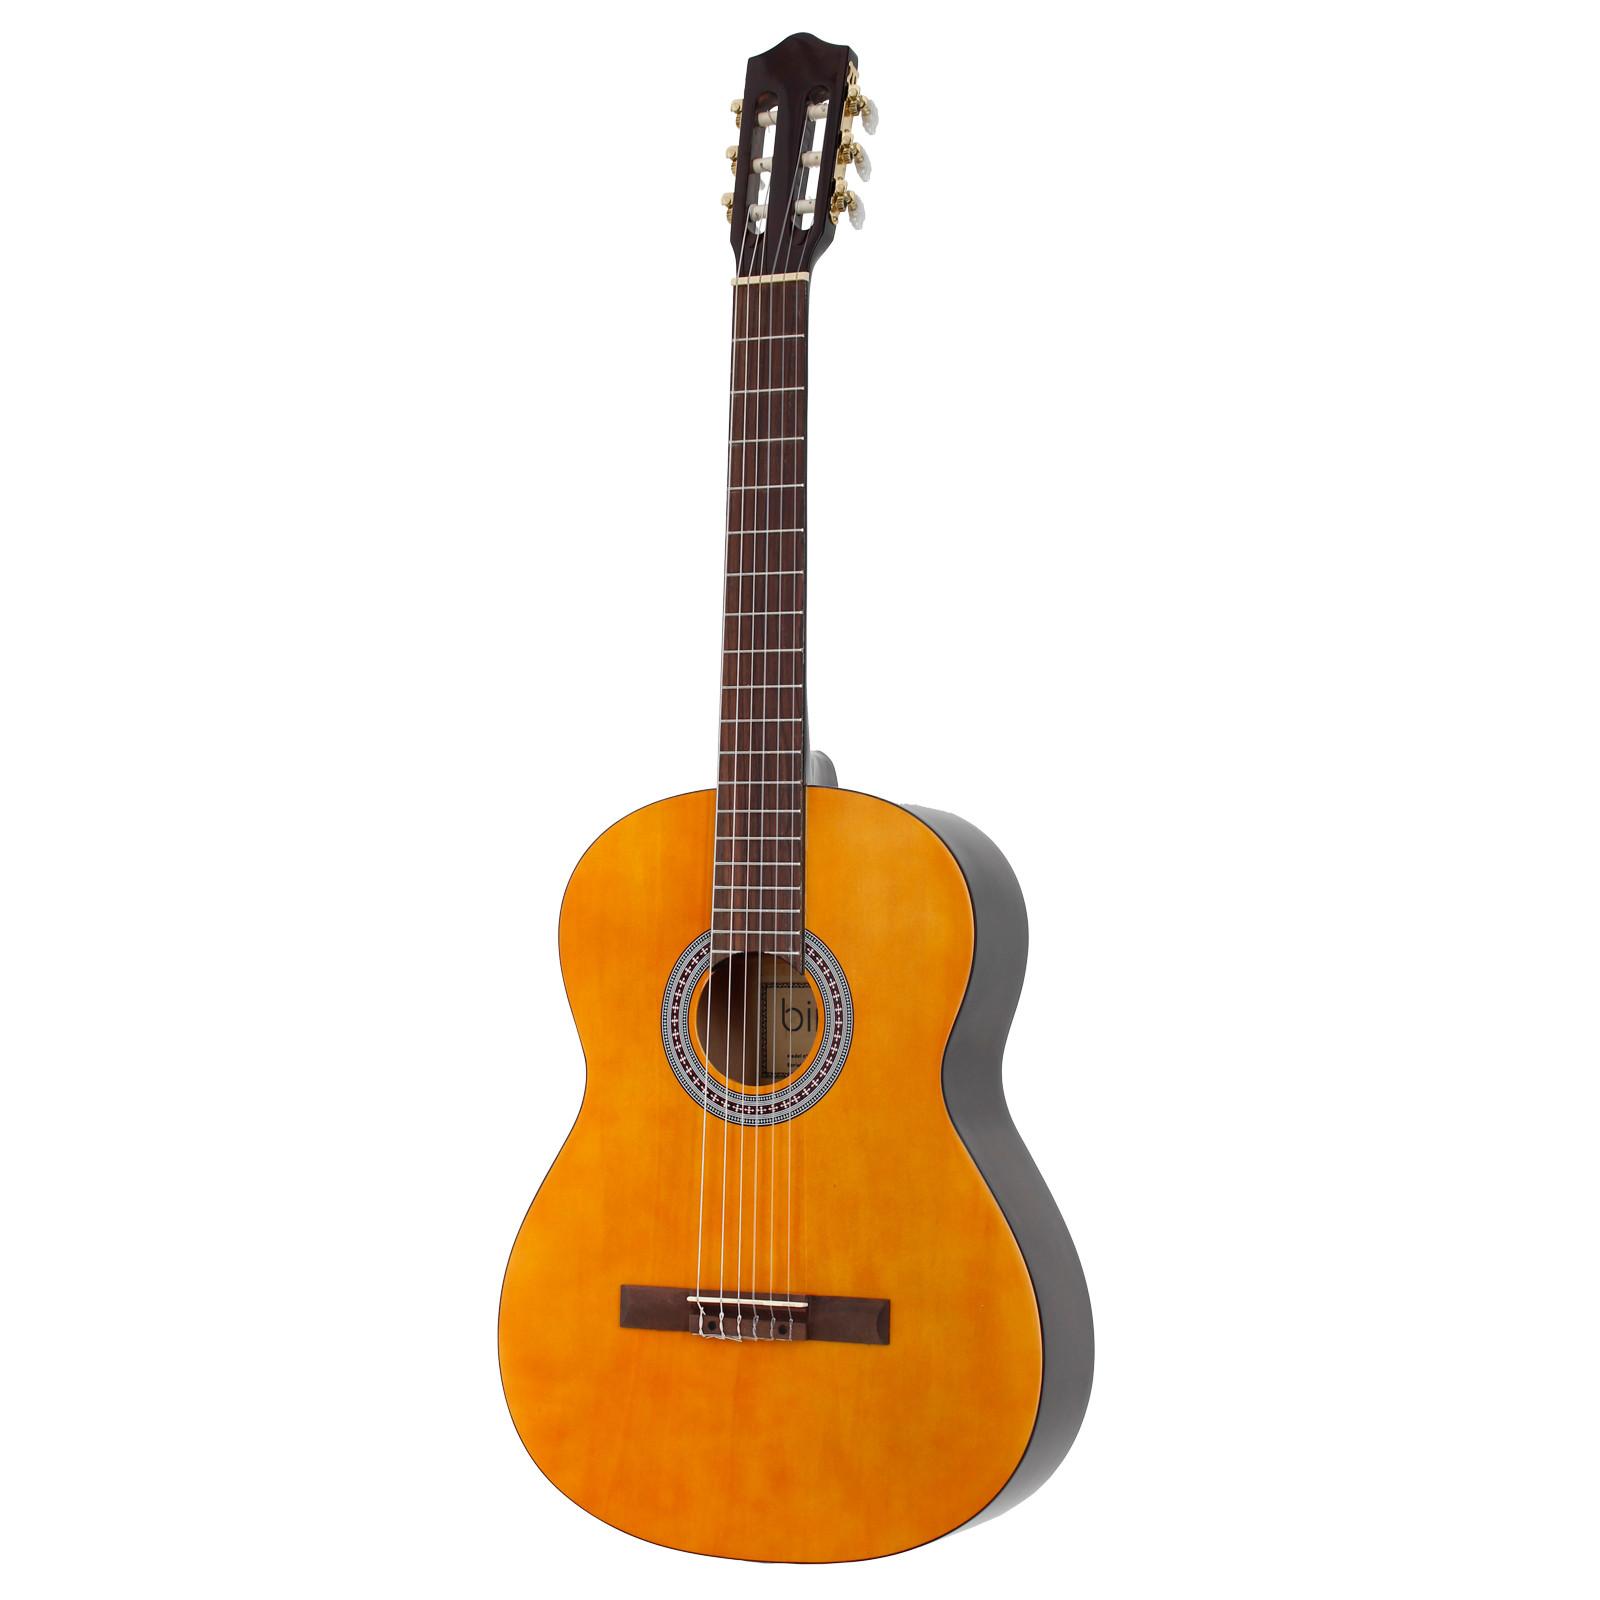 guitare naturelle achat vente de guitare pas cher. Black Bedroom Furniture Sets. Home Design Ideas